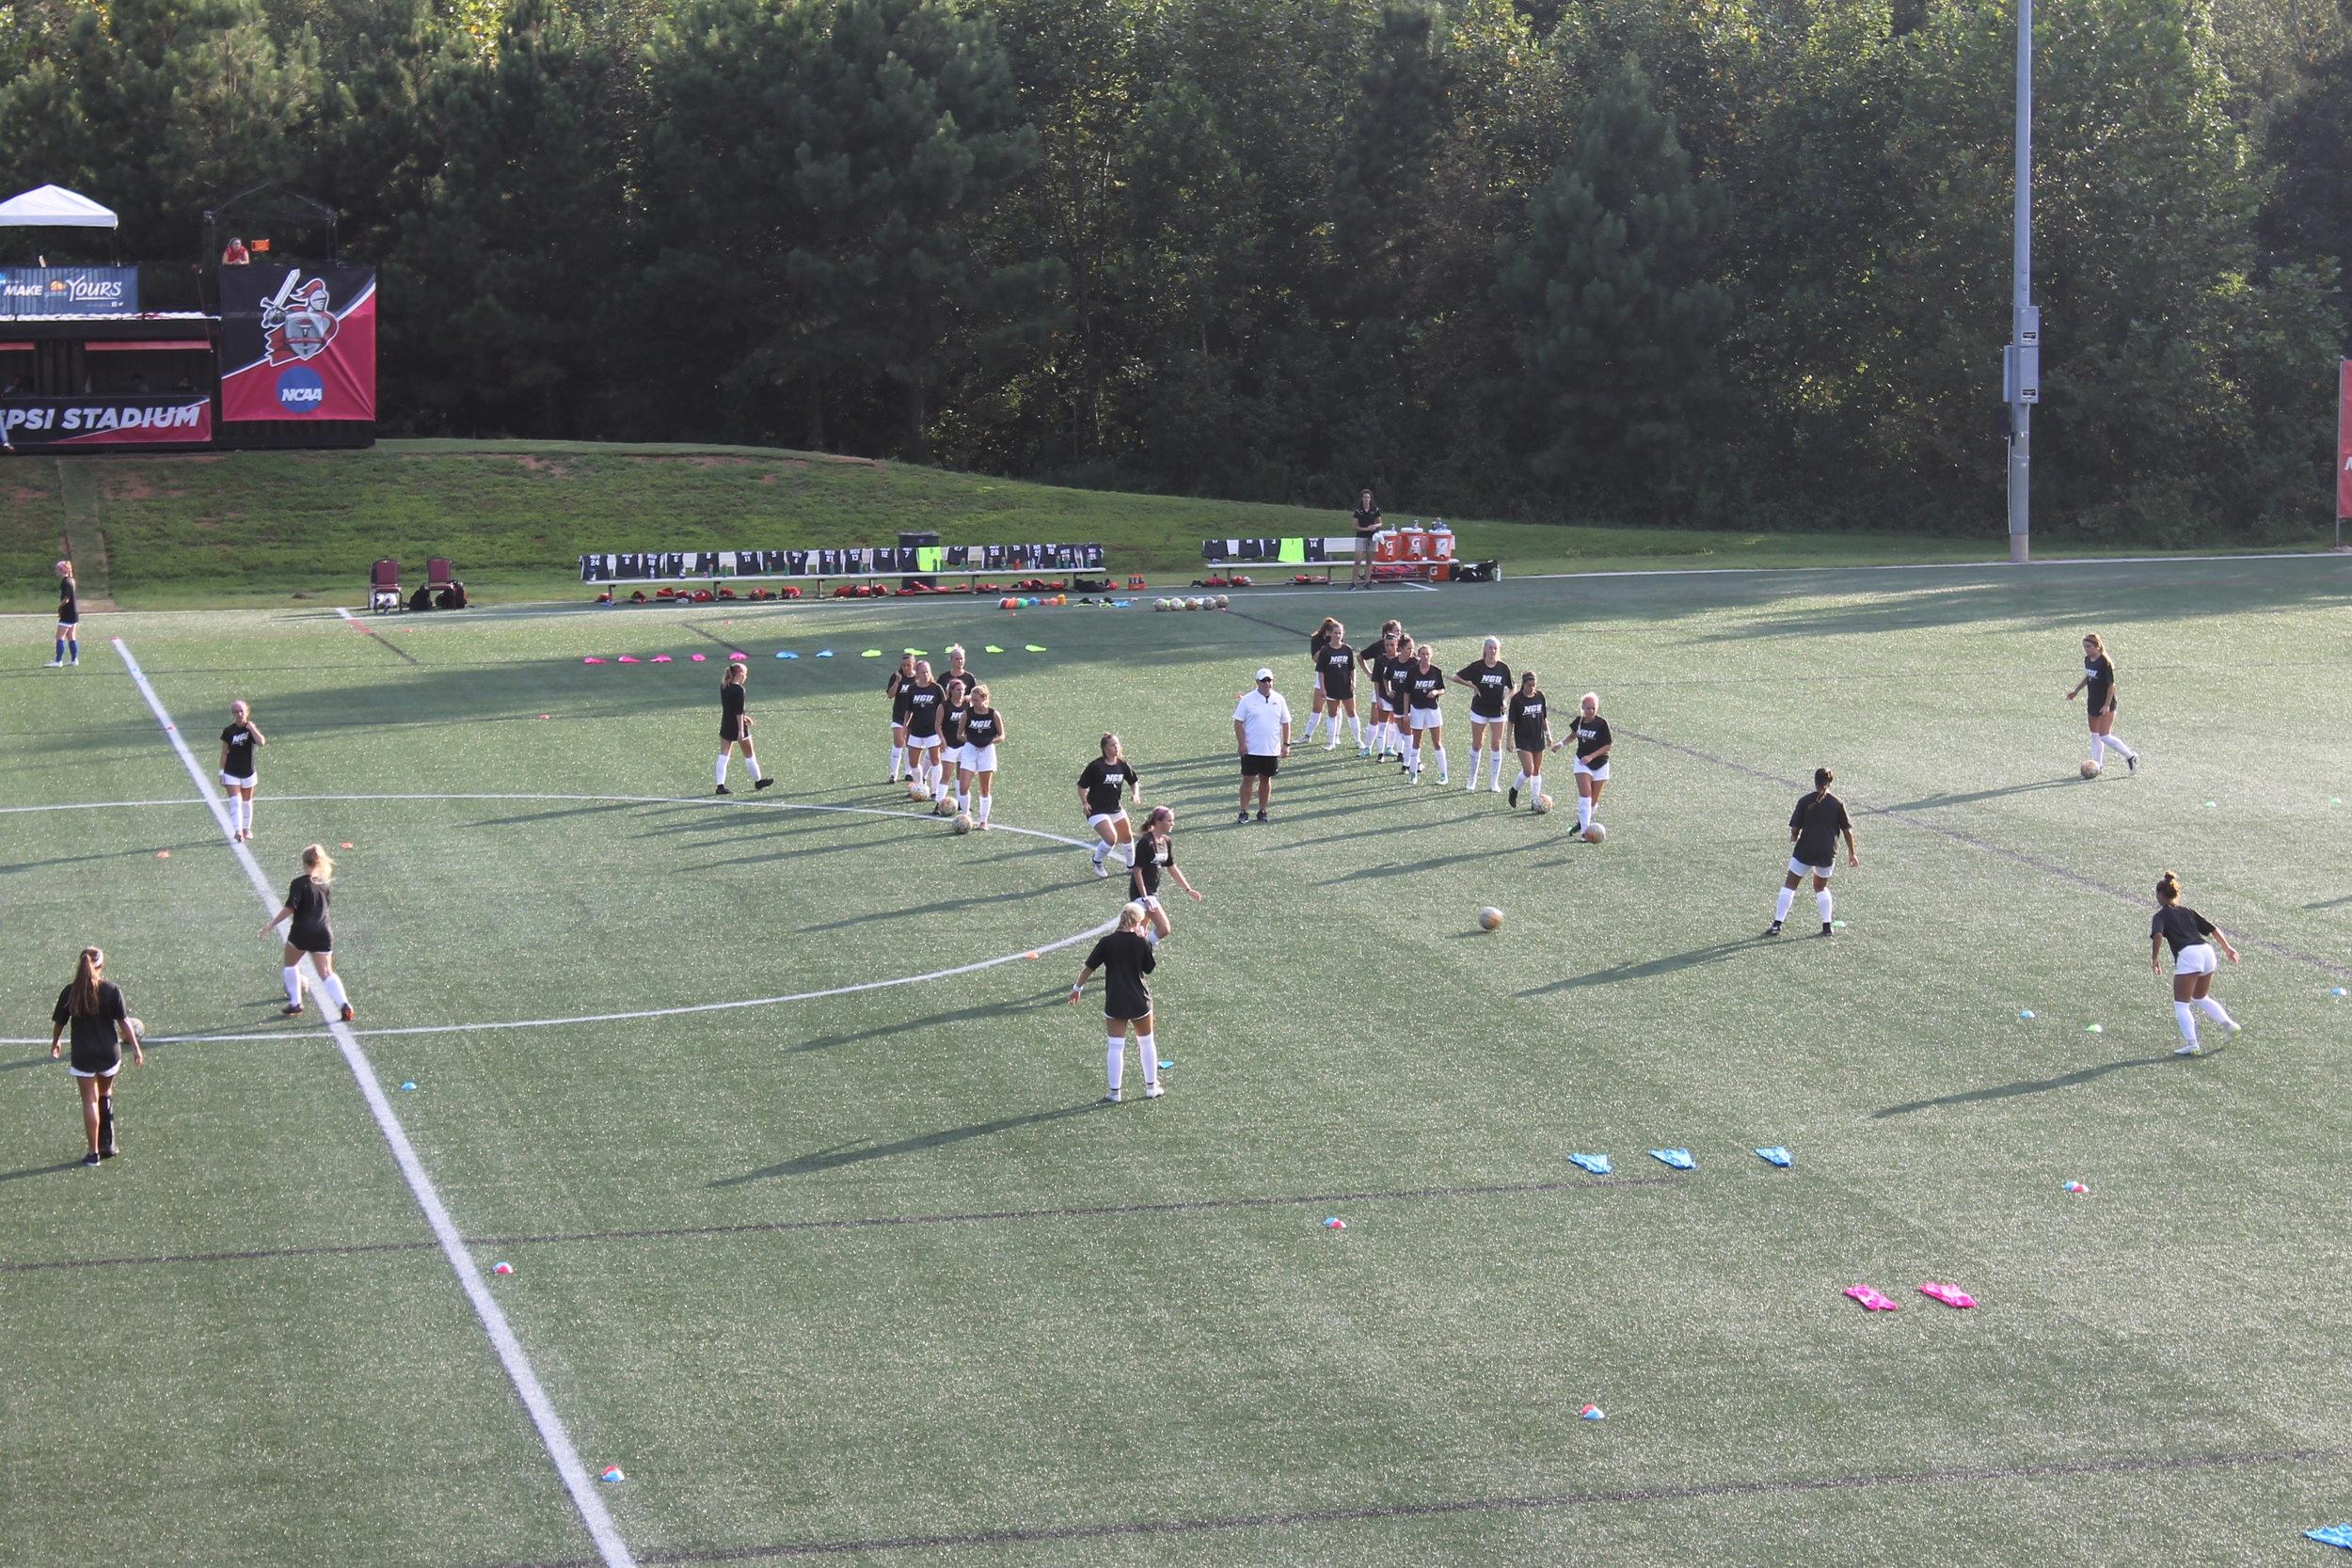 NGU ladies soccer team warming up before the game; preparing to play against Lander University.